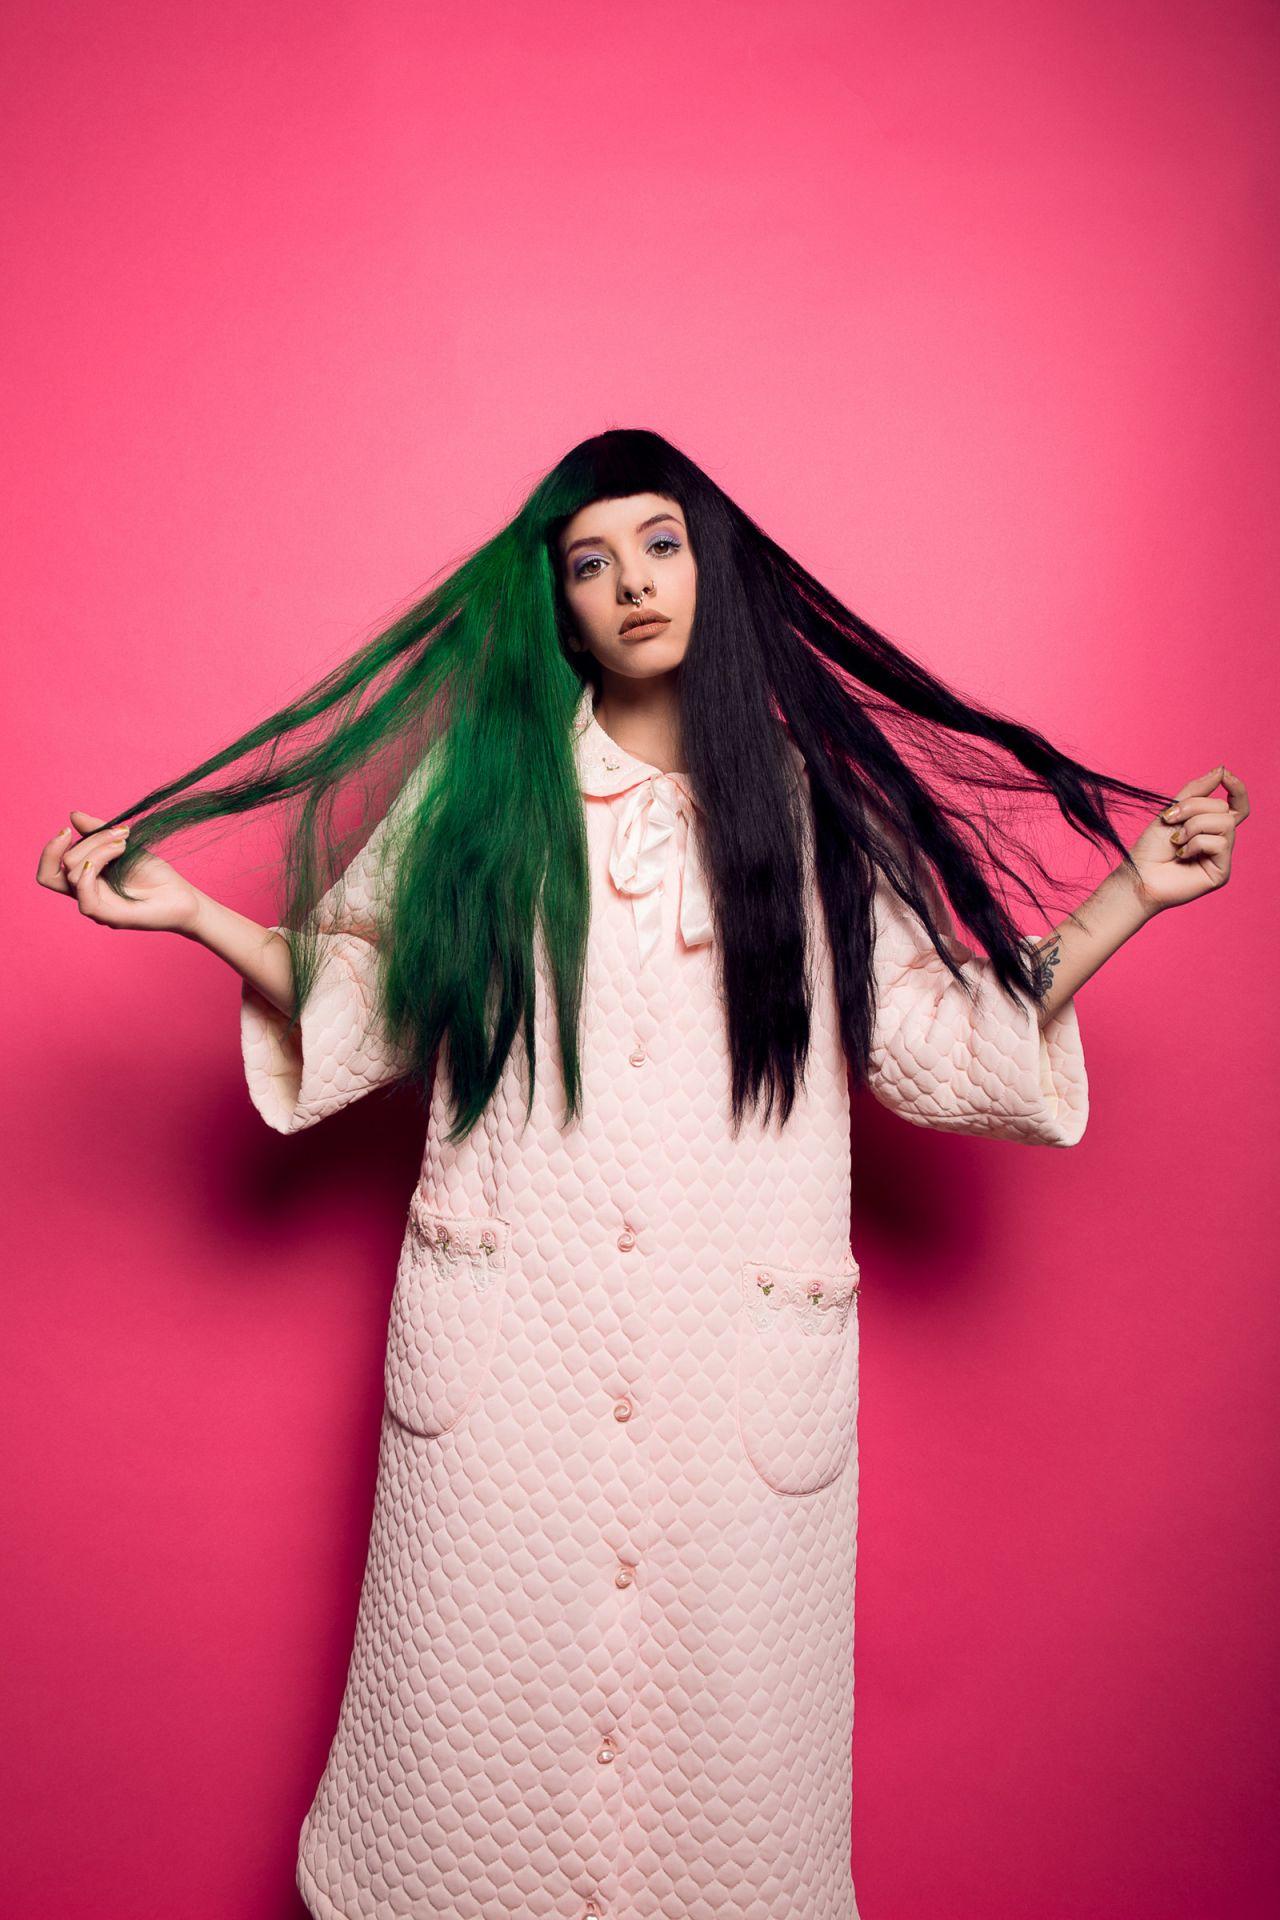 Photoshoot For Vogue Magazine November 2015: Melanie Martinez